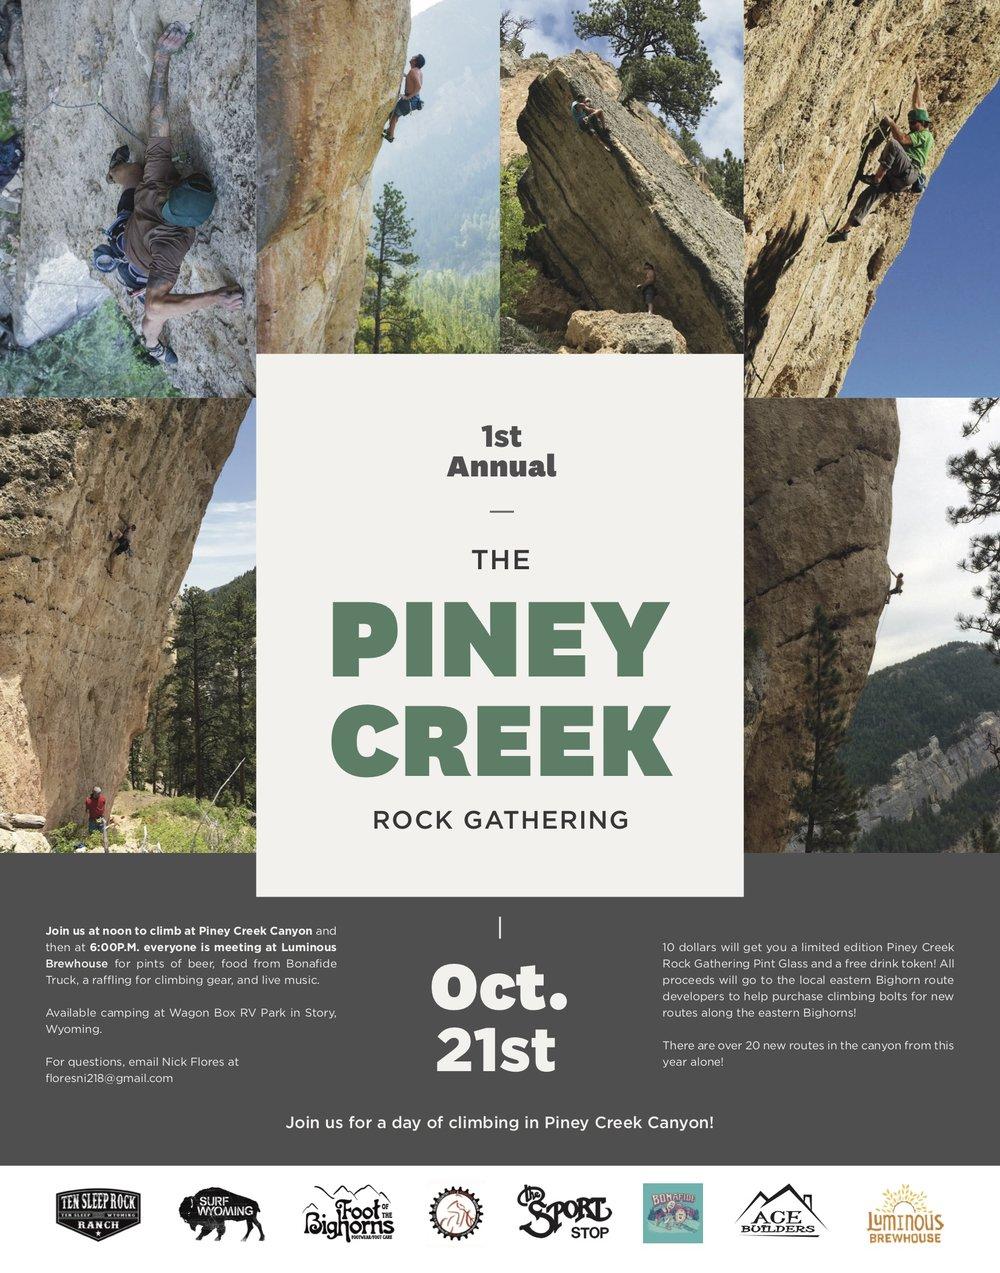 2017 Piney Creek Gathering Poster - Preview (1).jpg